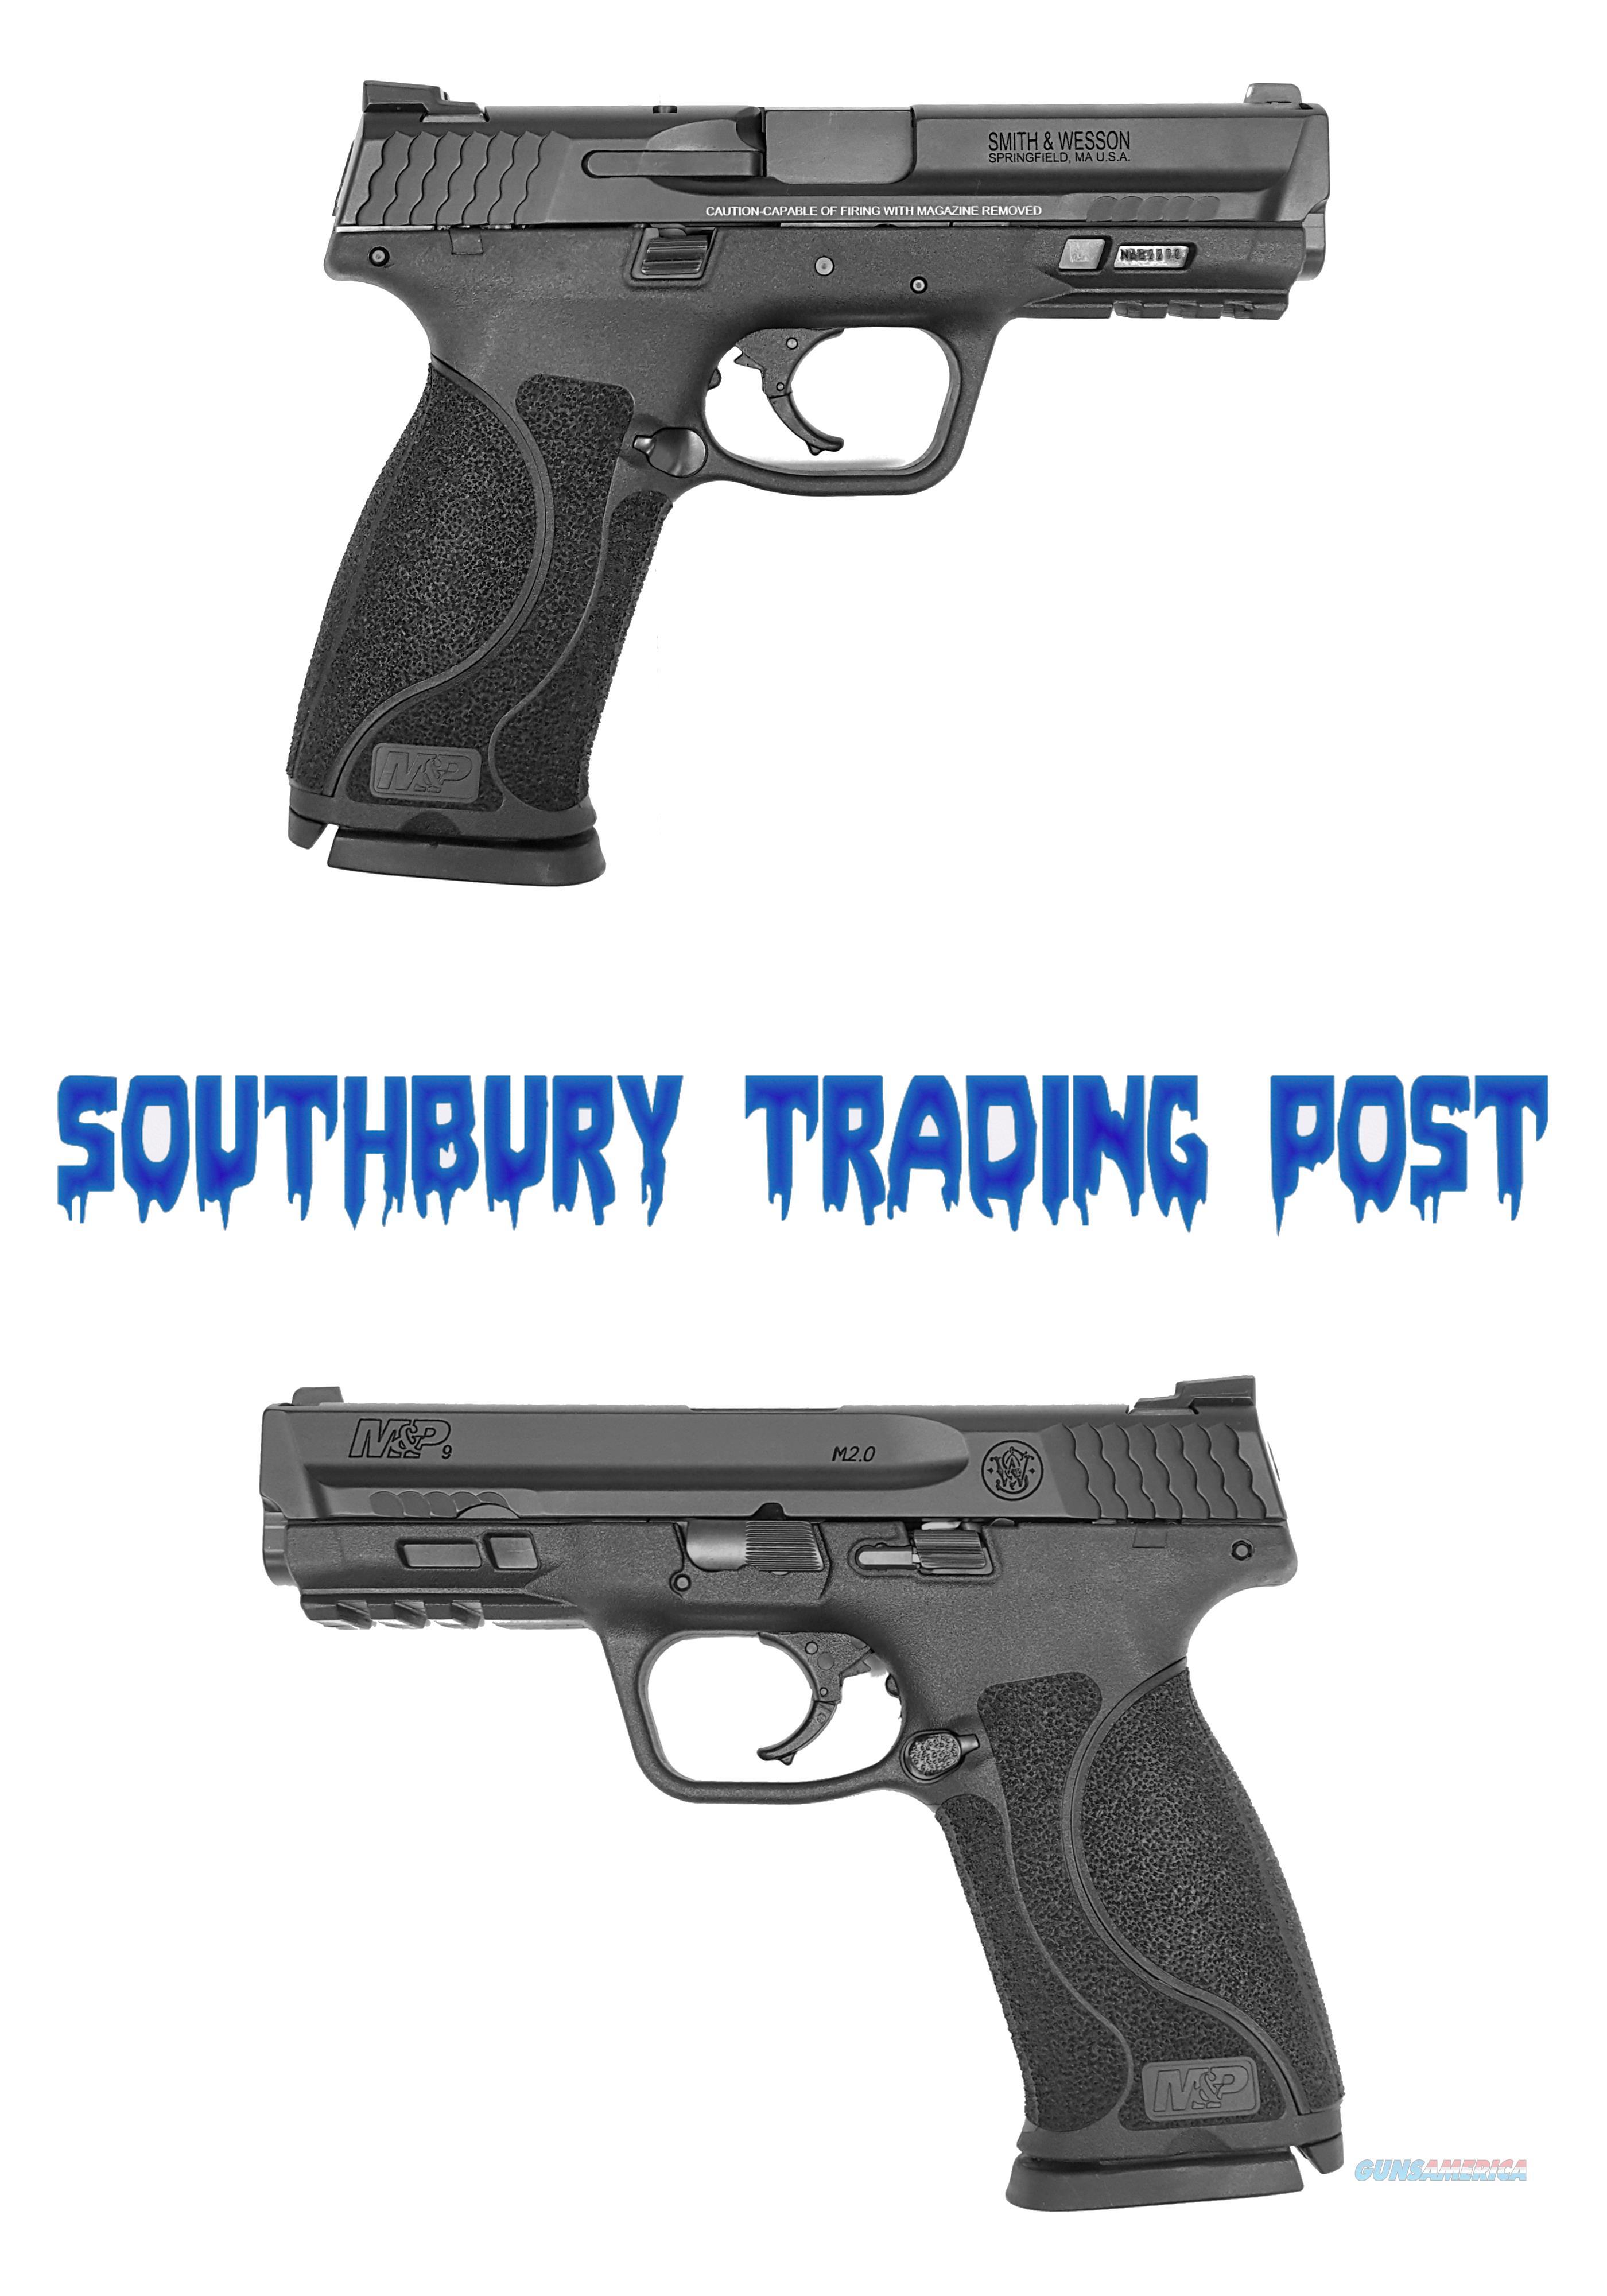 Smith & Wesson M&P9 M2.0 Semi-Automatic Pistol  Guns > Pistols > Smith & Wesson Pistols - Autos > Polymer Frame